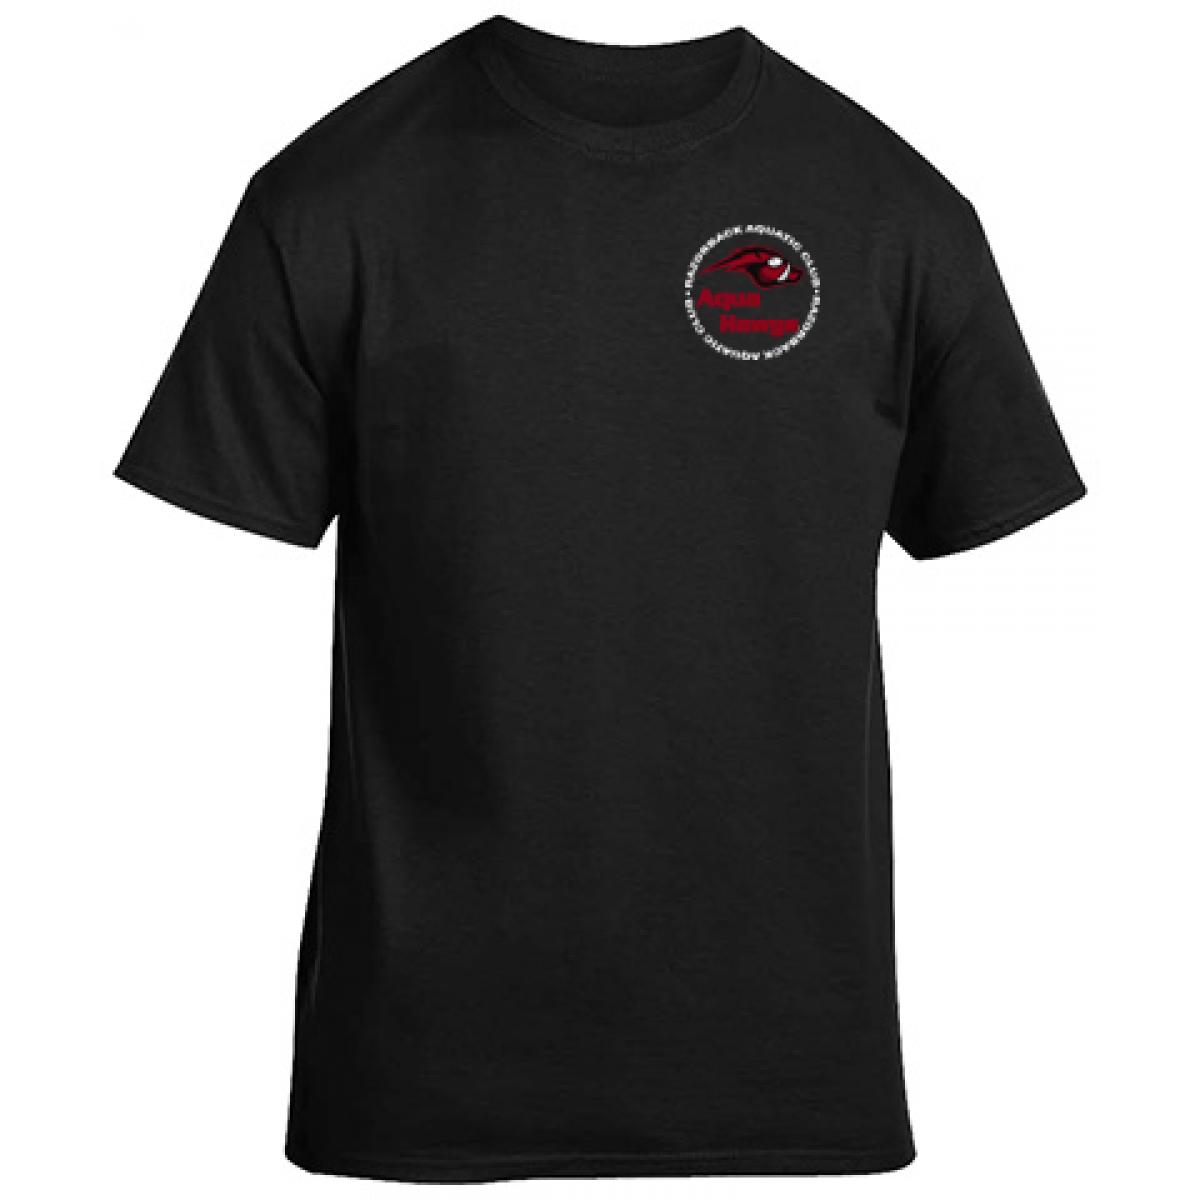 Gildan Cotton Short Sleeve T-Shirt - Black